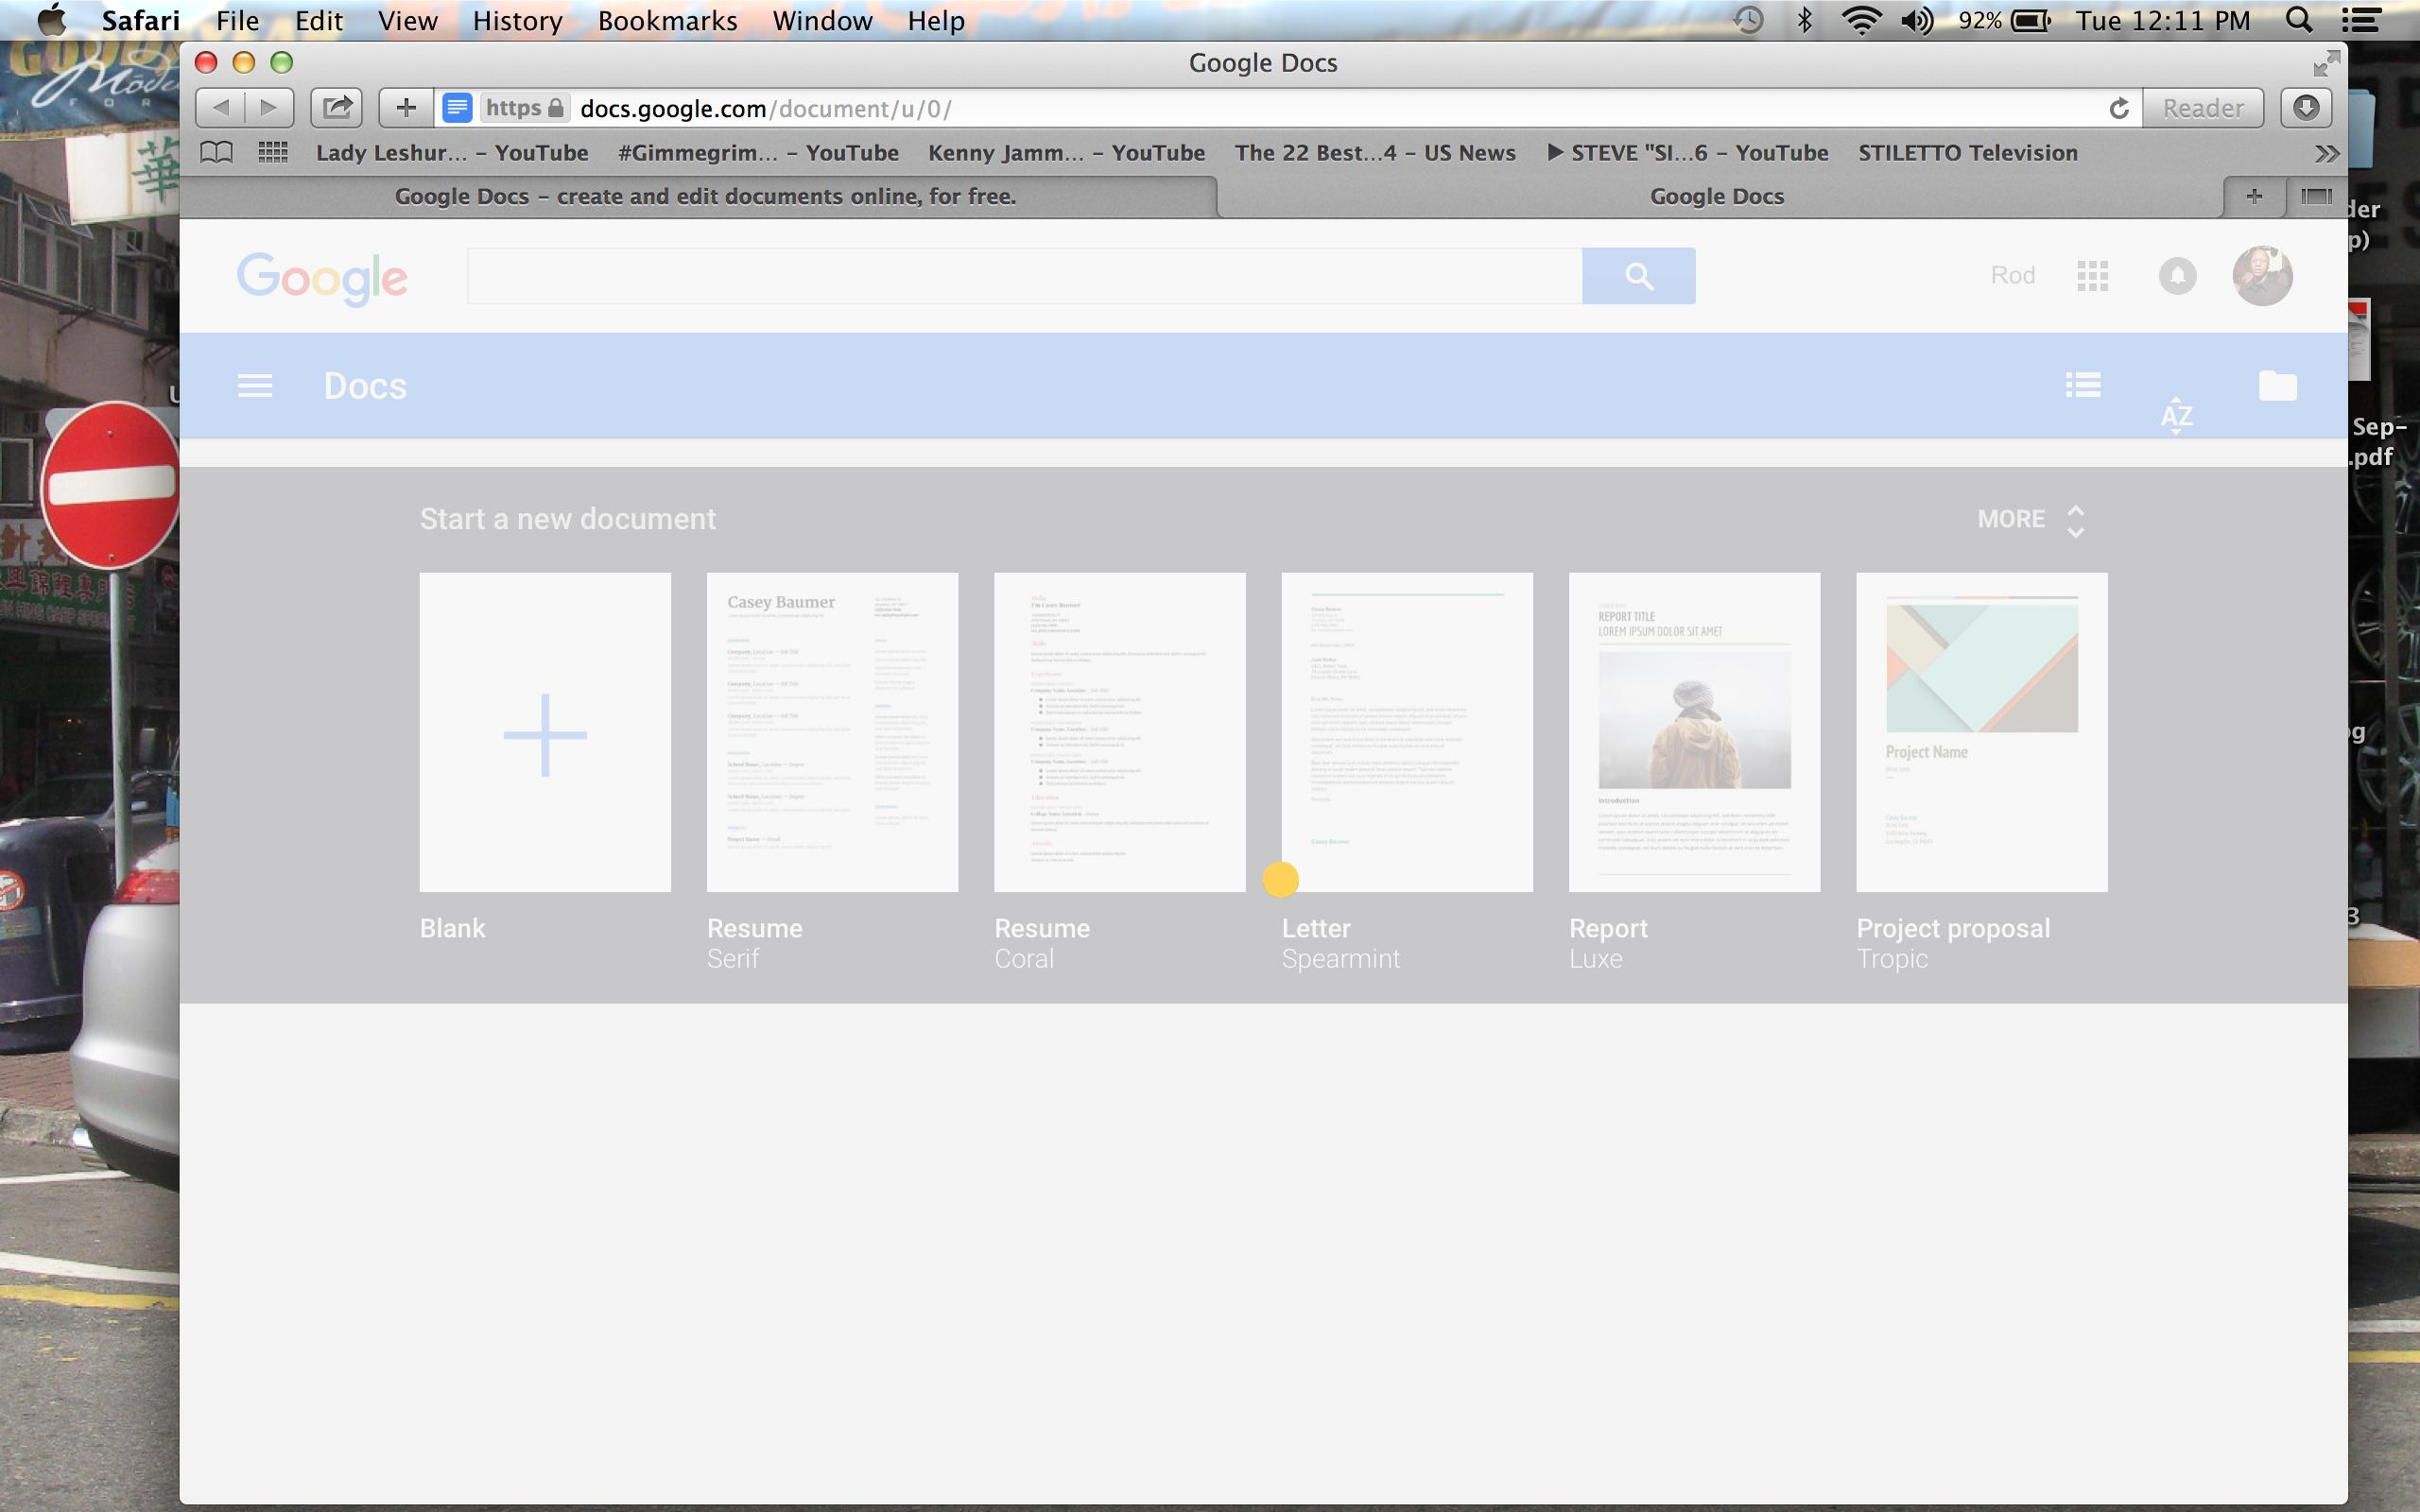 Google Docs won't load or let me proceed once i click on